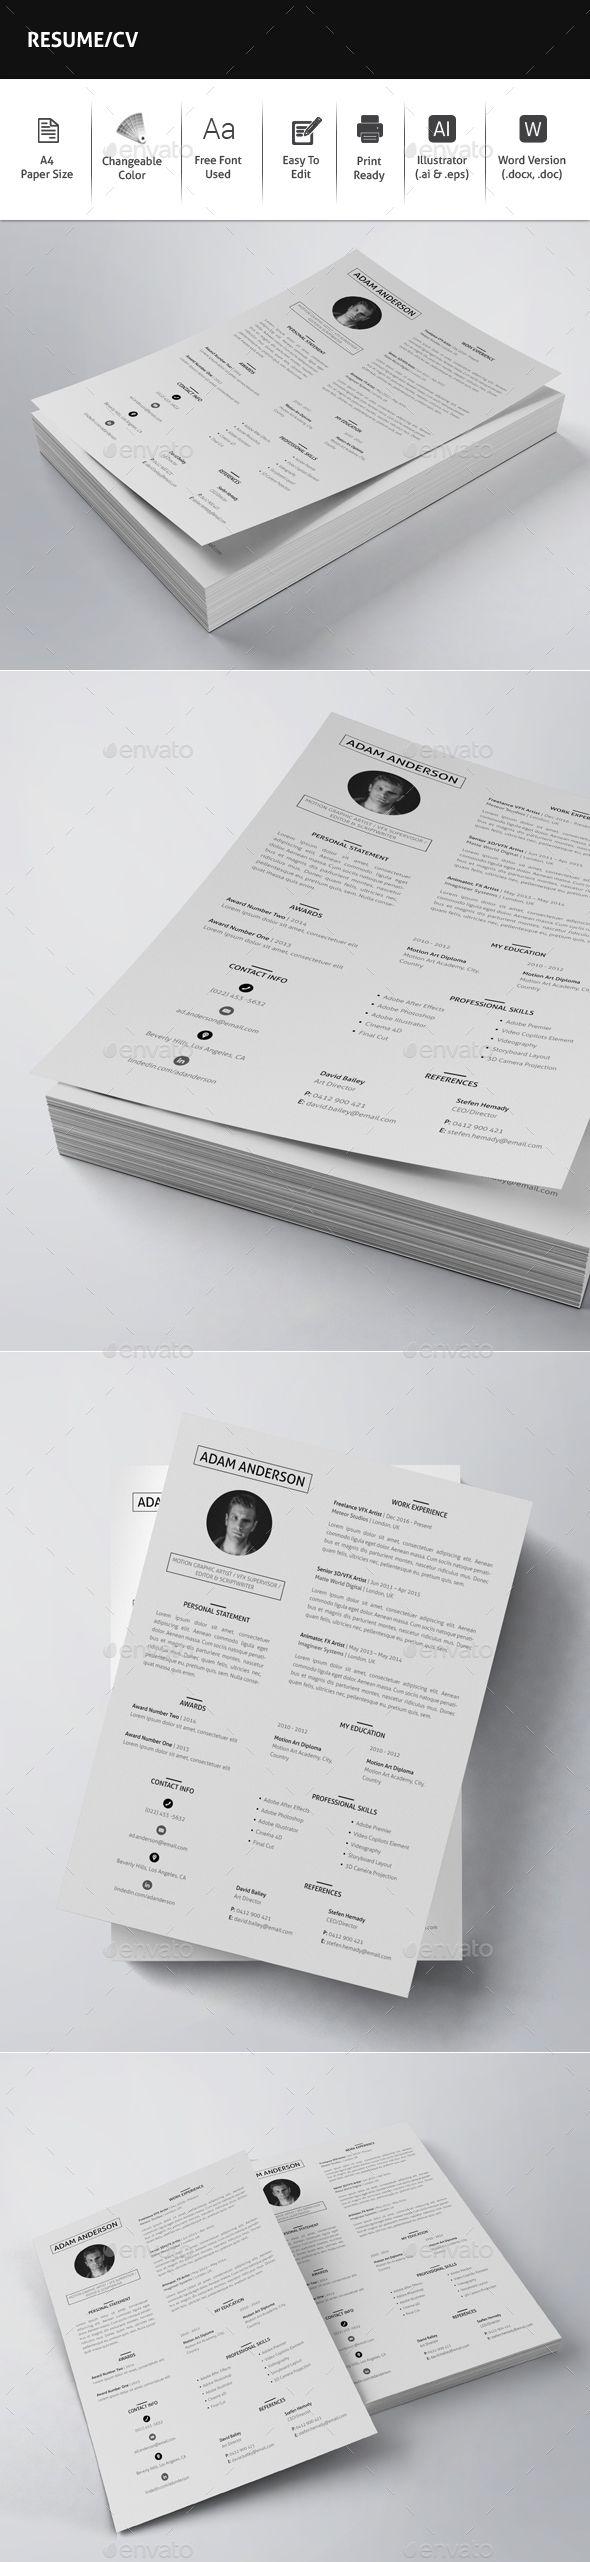 Resume / CV Template Vector EPS, AI Illustrator, MS Word